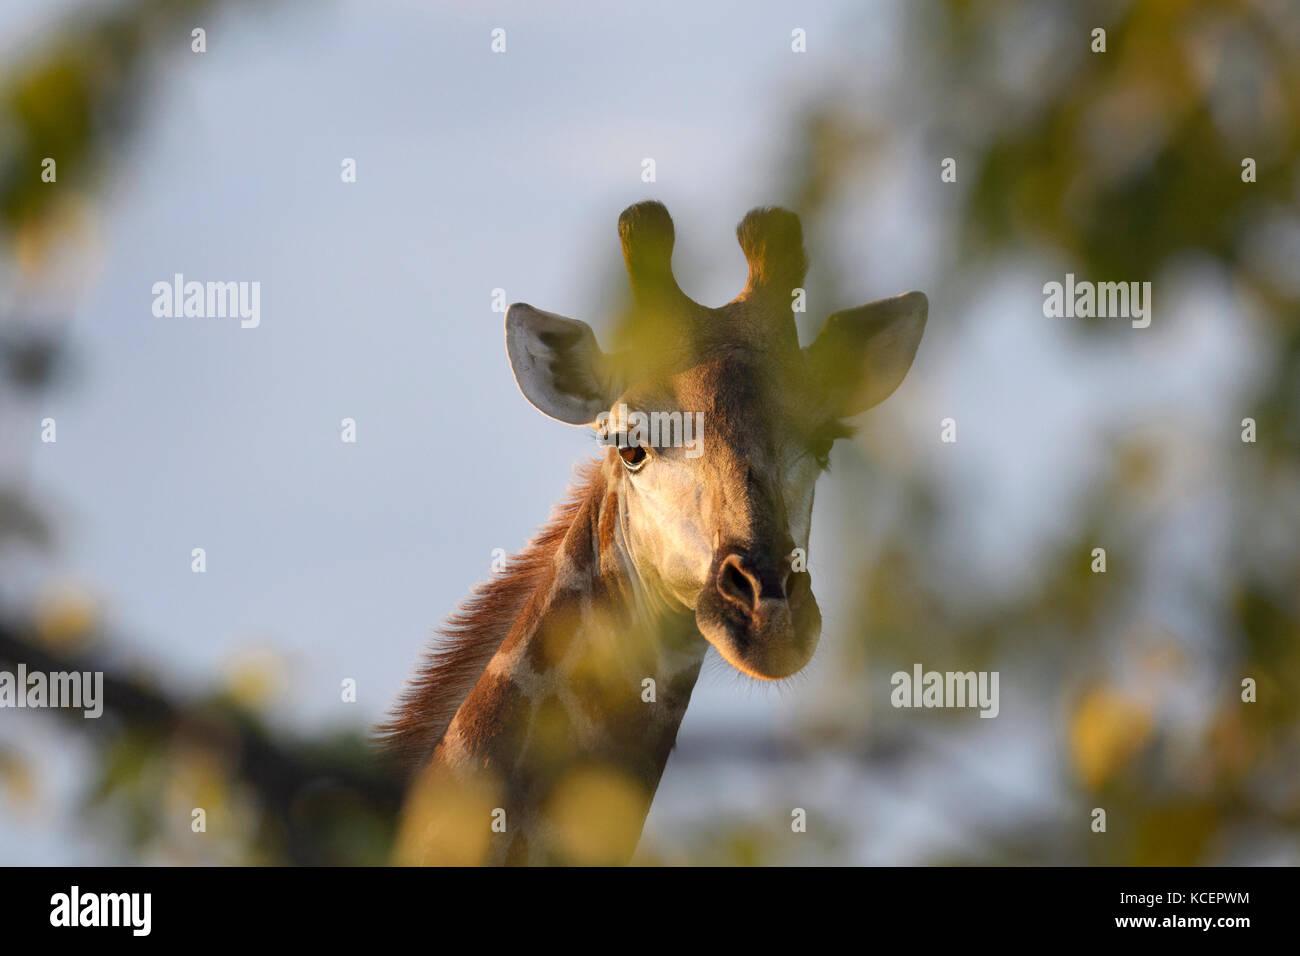 Girafe (Giraffa camelopardalis) looking at camera de derrière un arbre, Kruger National Park, Afrique du Sud Photo Stock